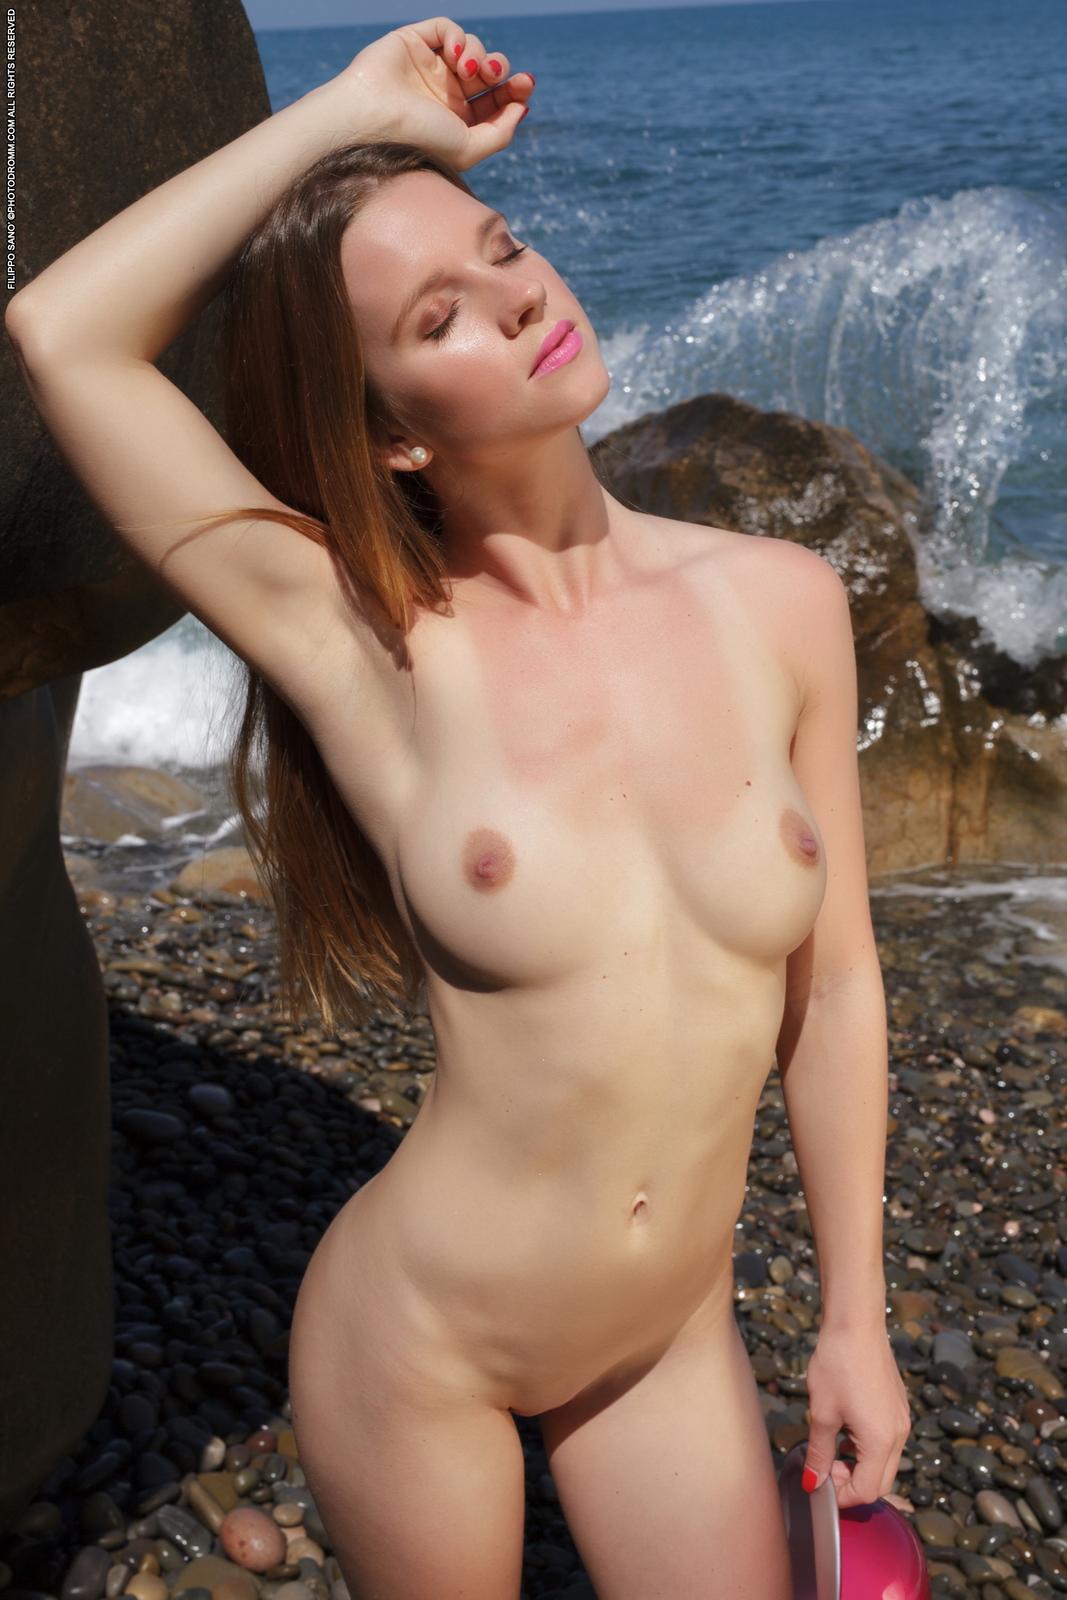 amanda-seaside-beach-nude-photodromm-09